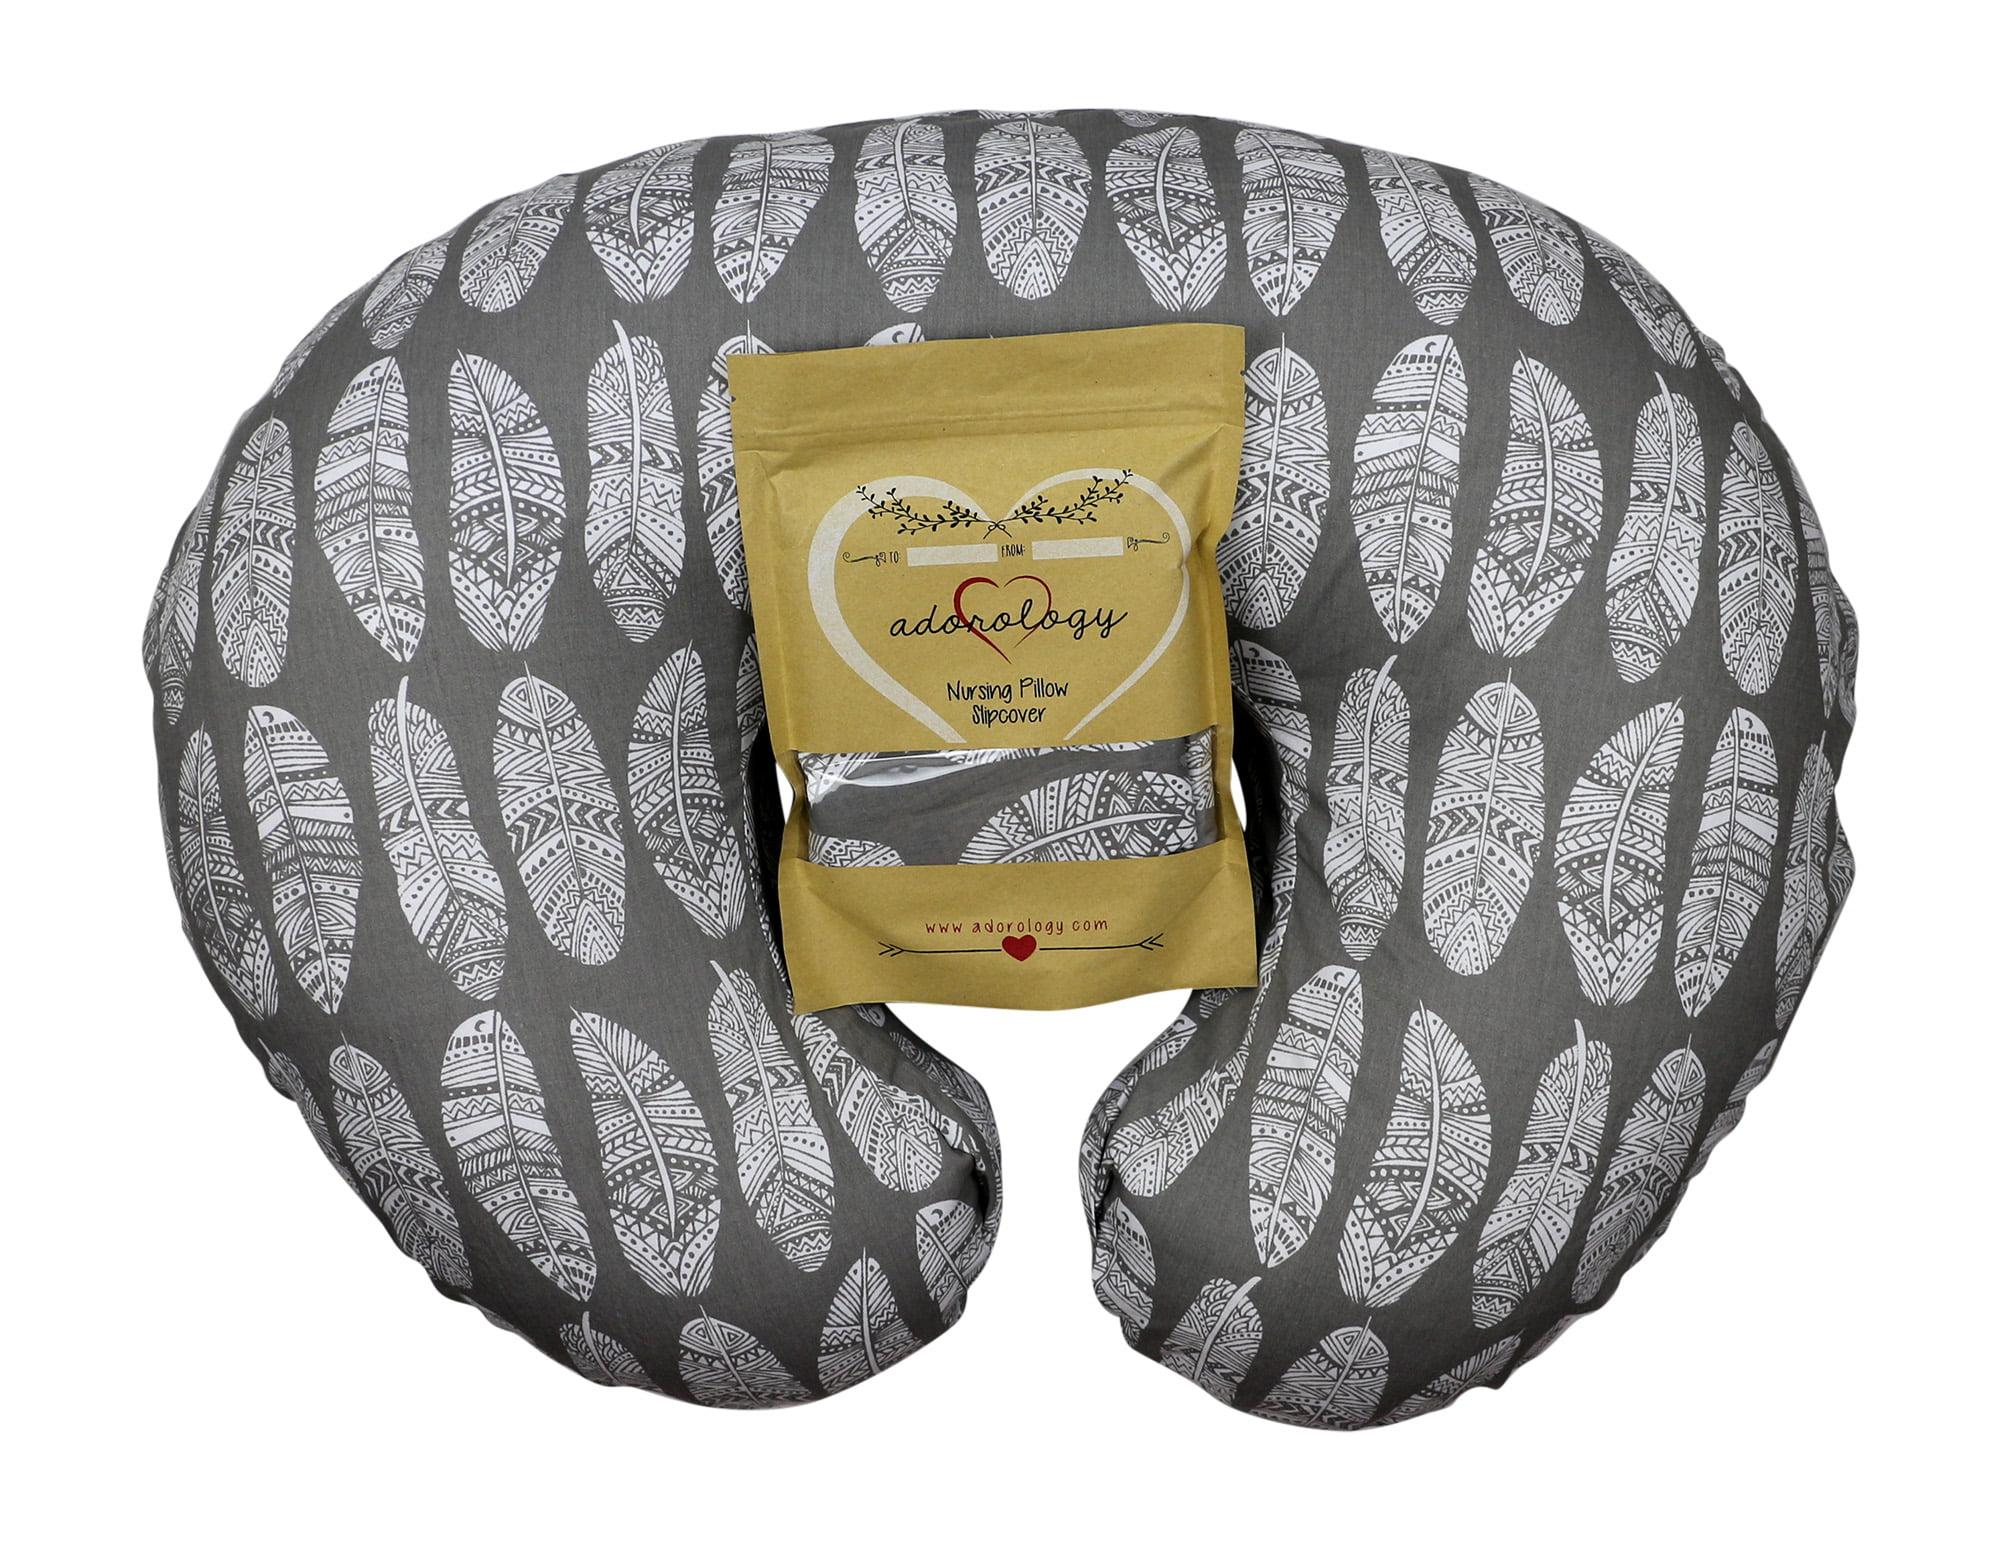 Nursing Pillow Slipcover Gray Feathers Design Maternity Breastfeeding Newborn Infant Feeding Cushion Cover... by Adorology